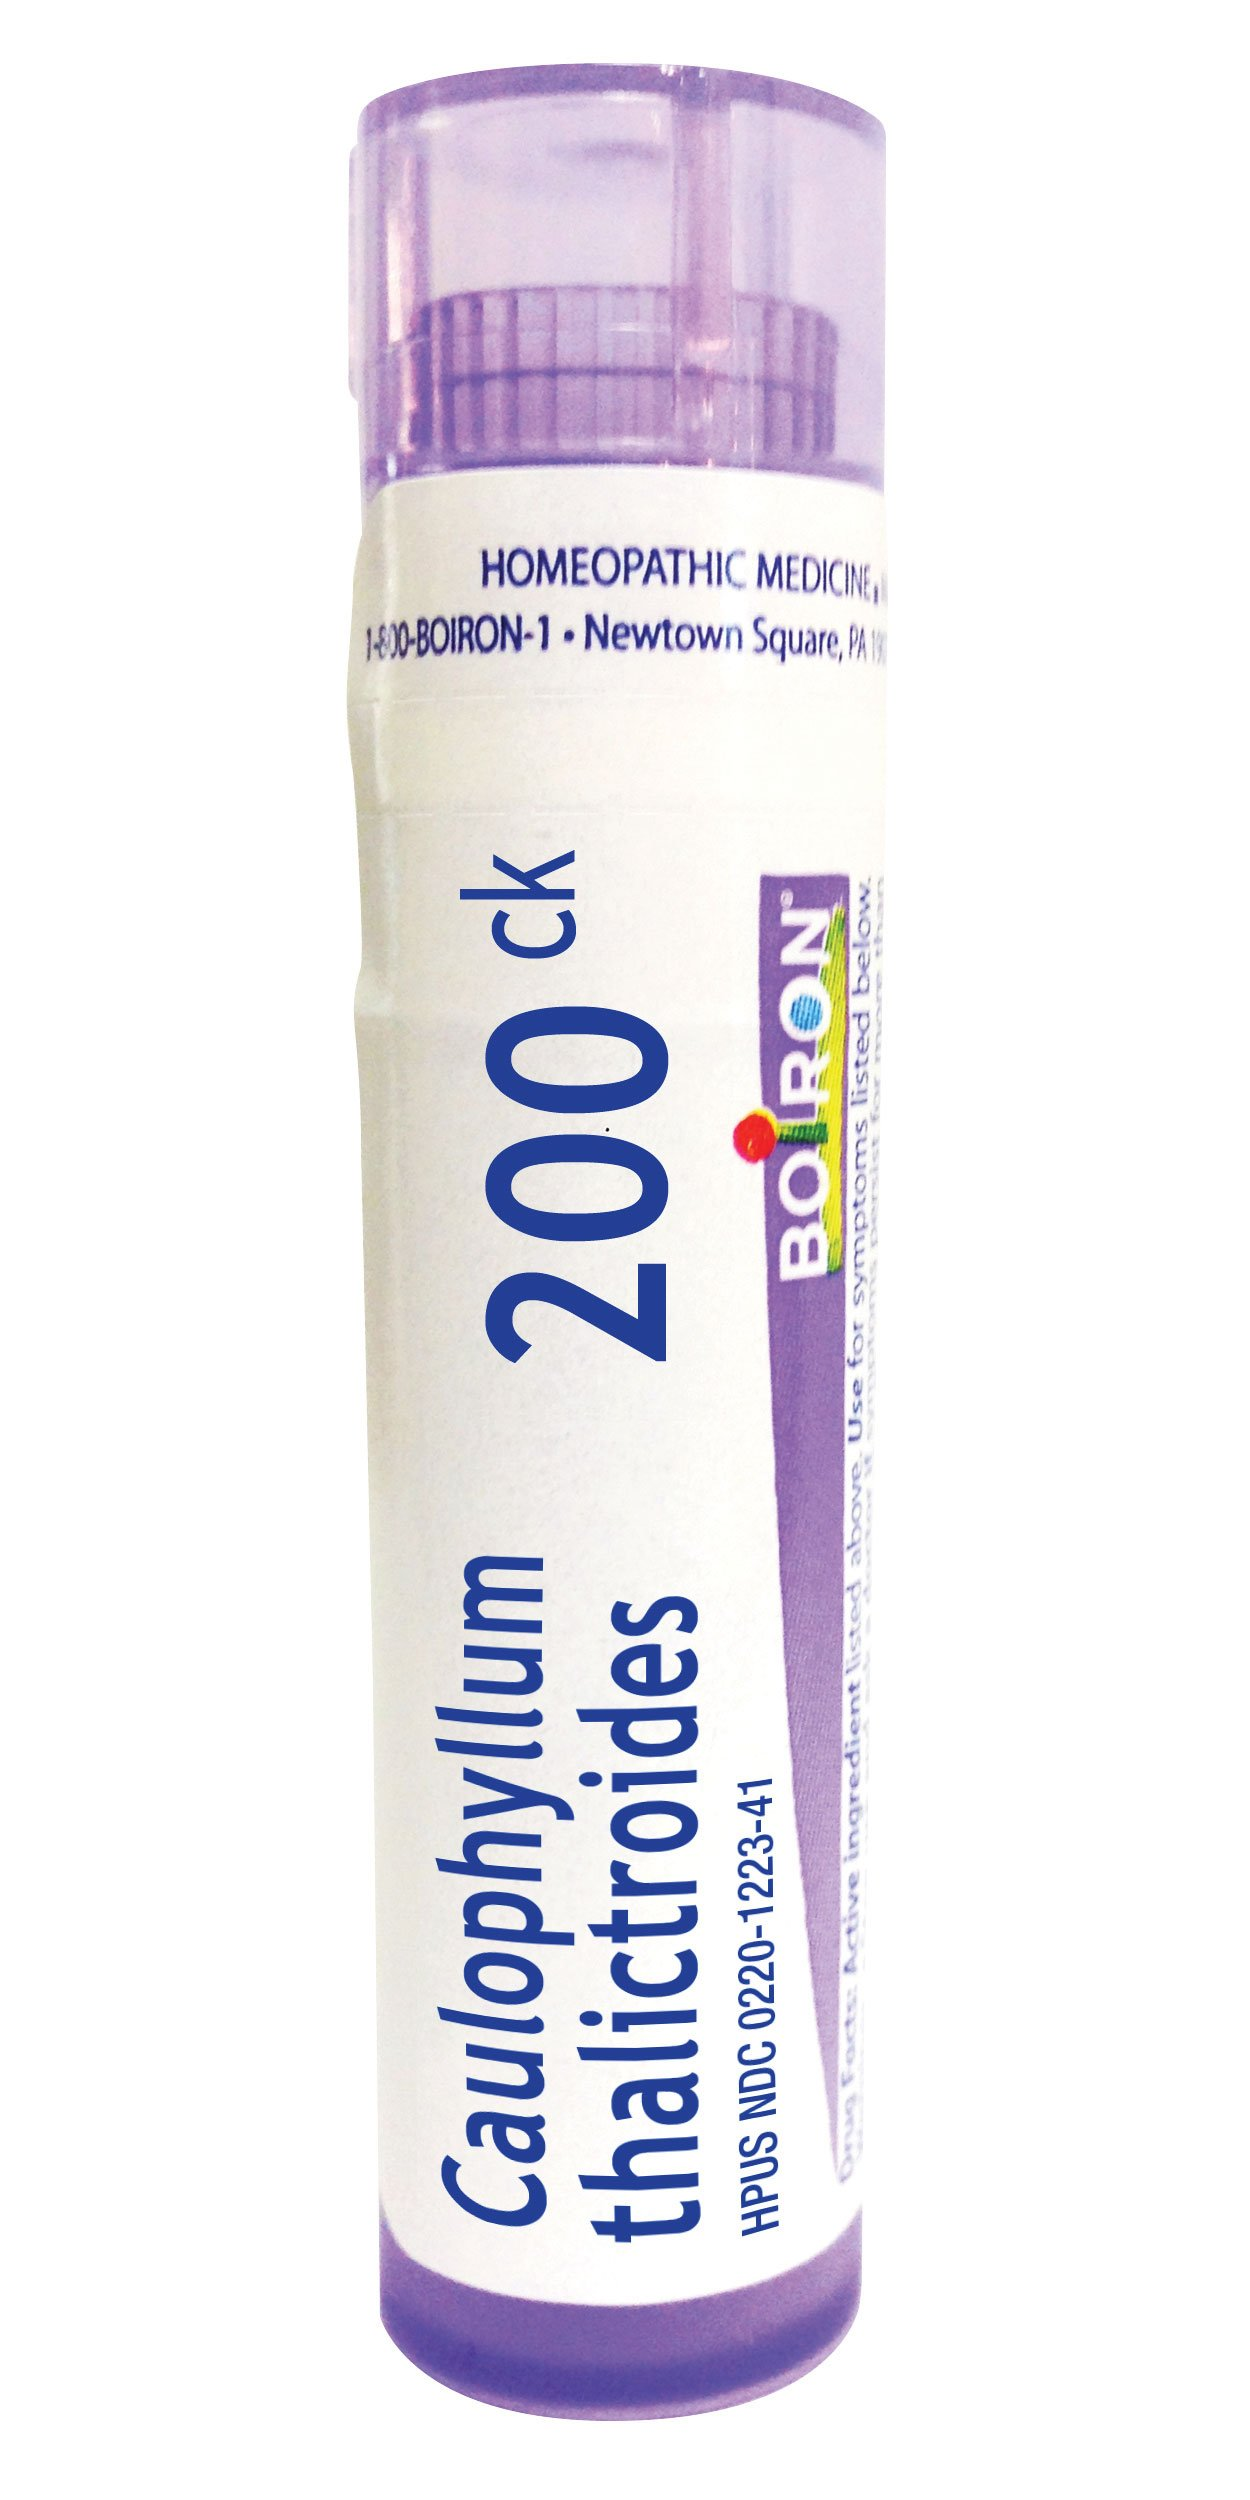 Boiron Caulophyllum Thalictroides 200C, 80 Pellets, Homeopathic Medicine for Menstrual Cramps